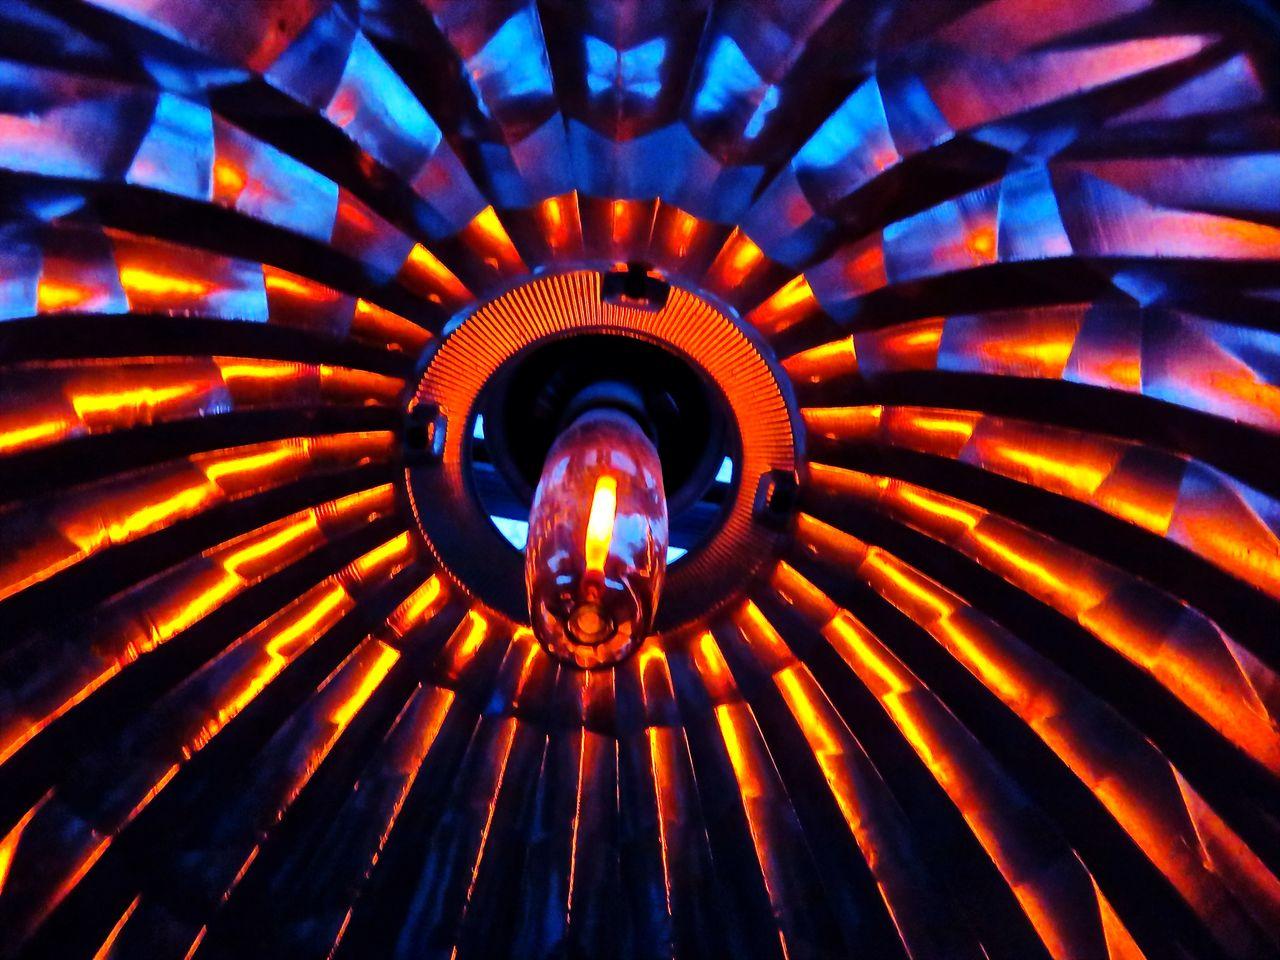 Glowing Grow Light After Glow Lamp Lighting Dim Light Fading